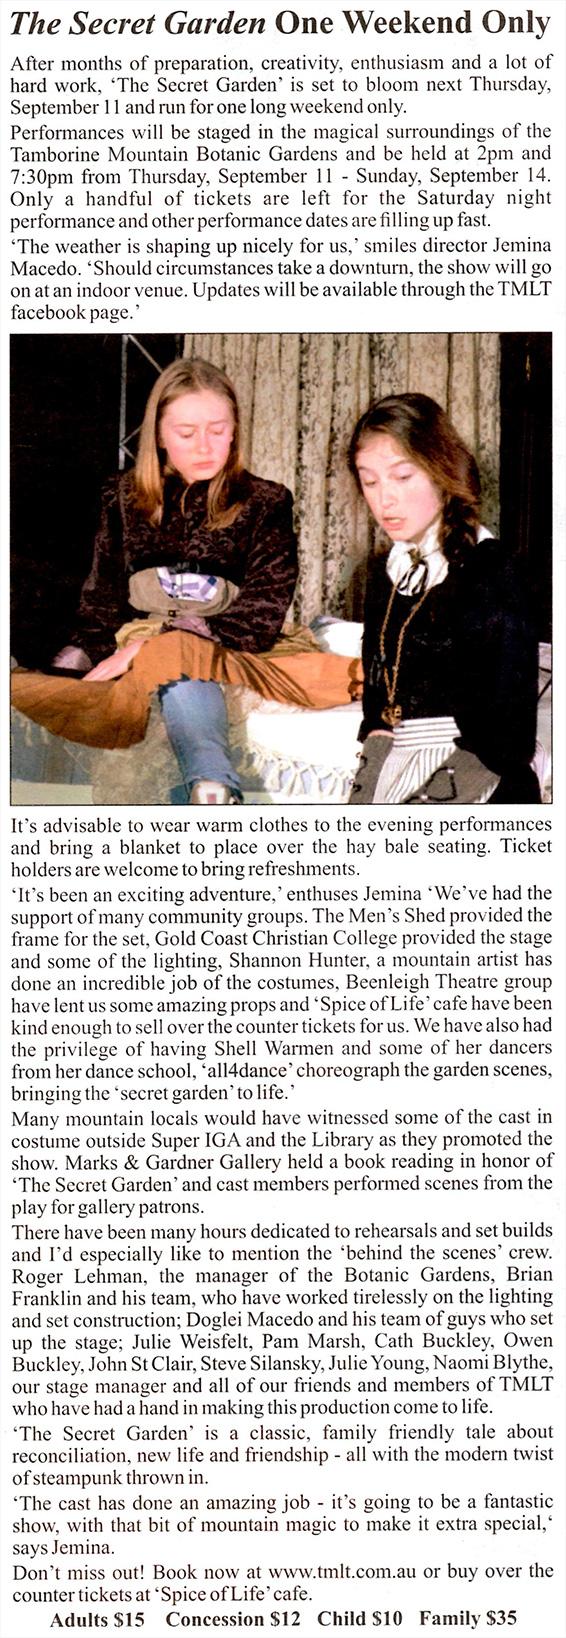 Tamborine Times, 4/9/2014